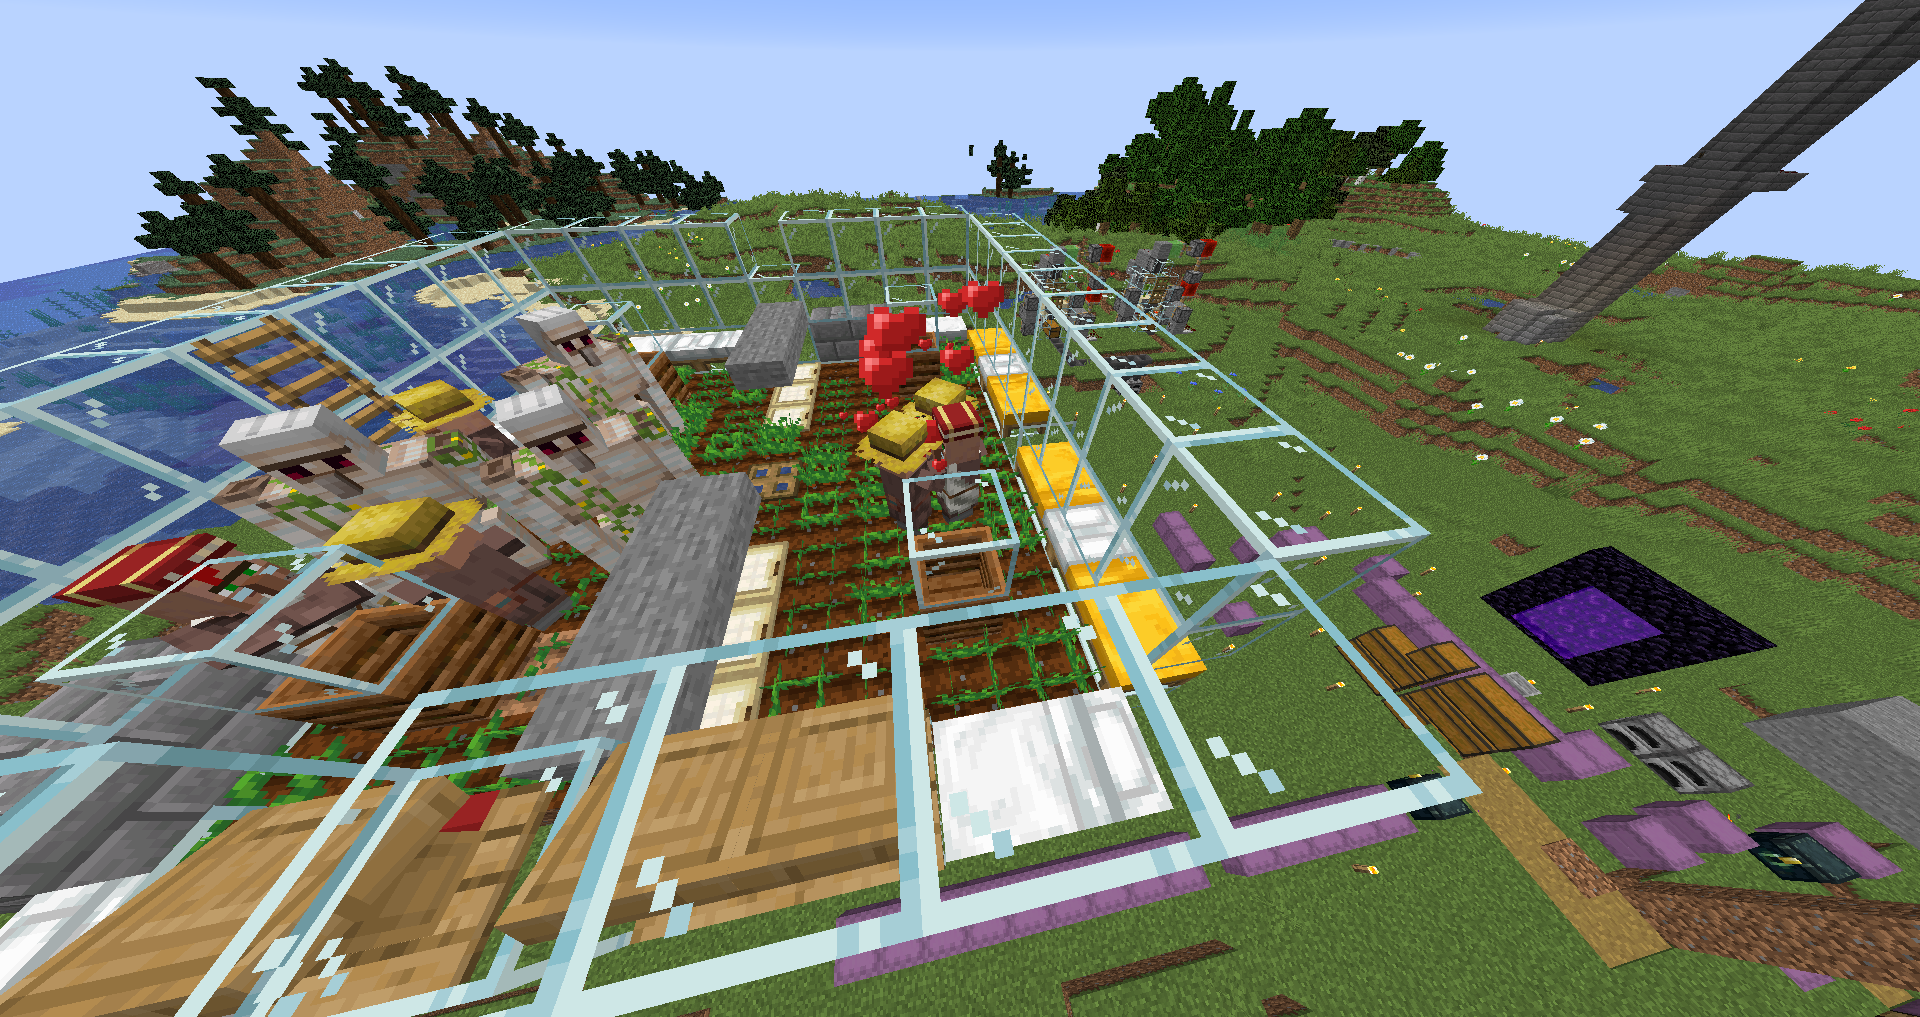 Help with Villager Breeding - Discussion - Minecraft: Java Edition